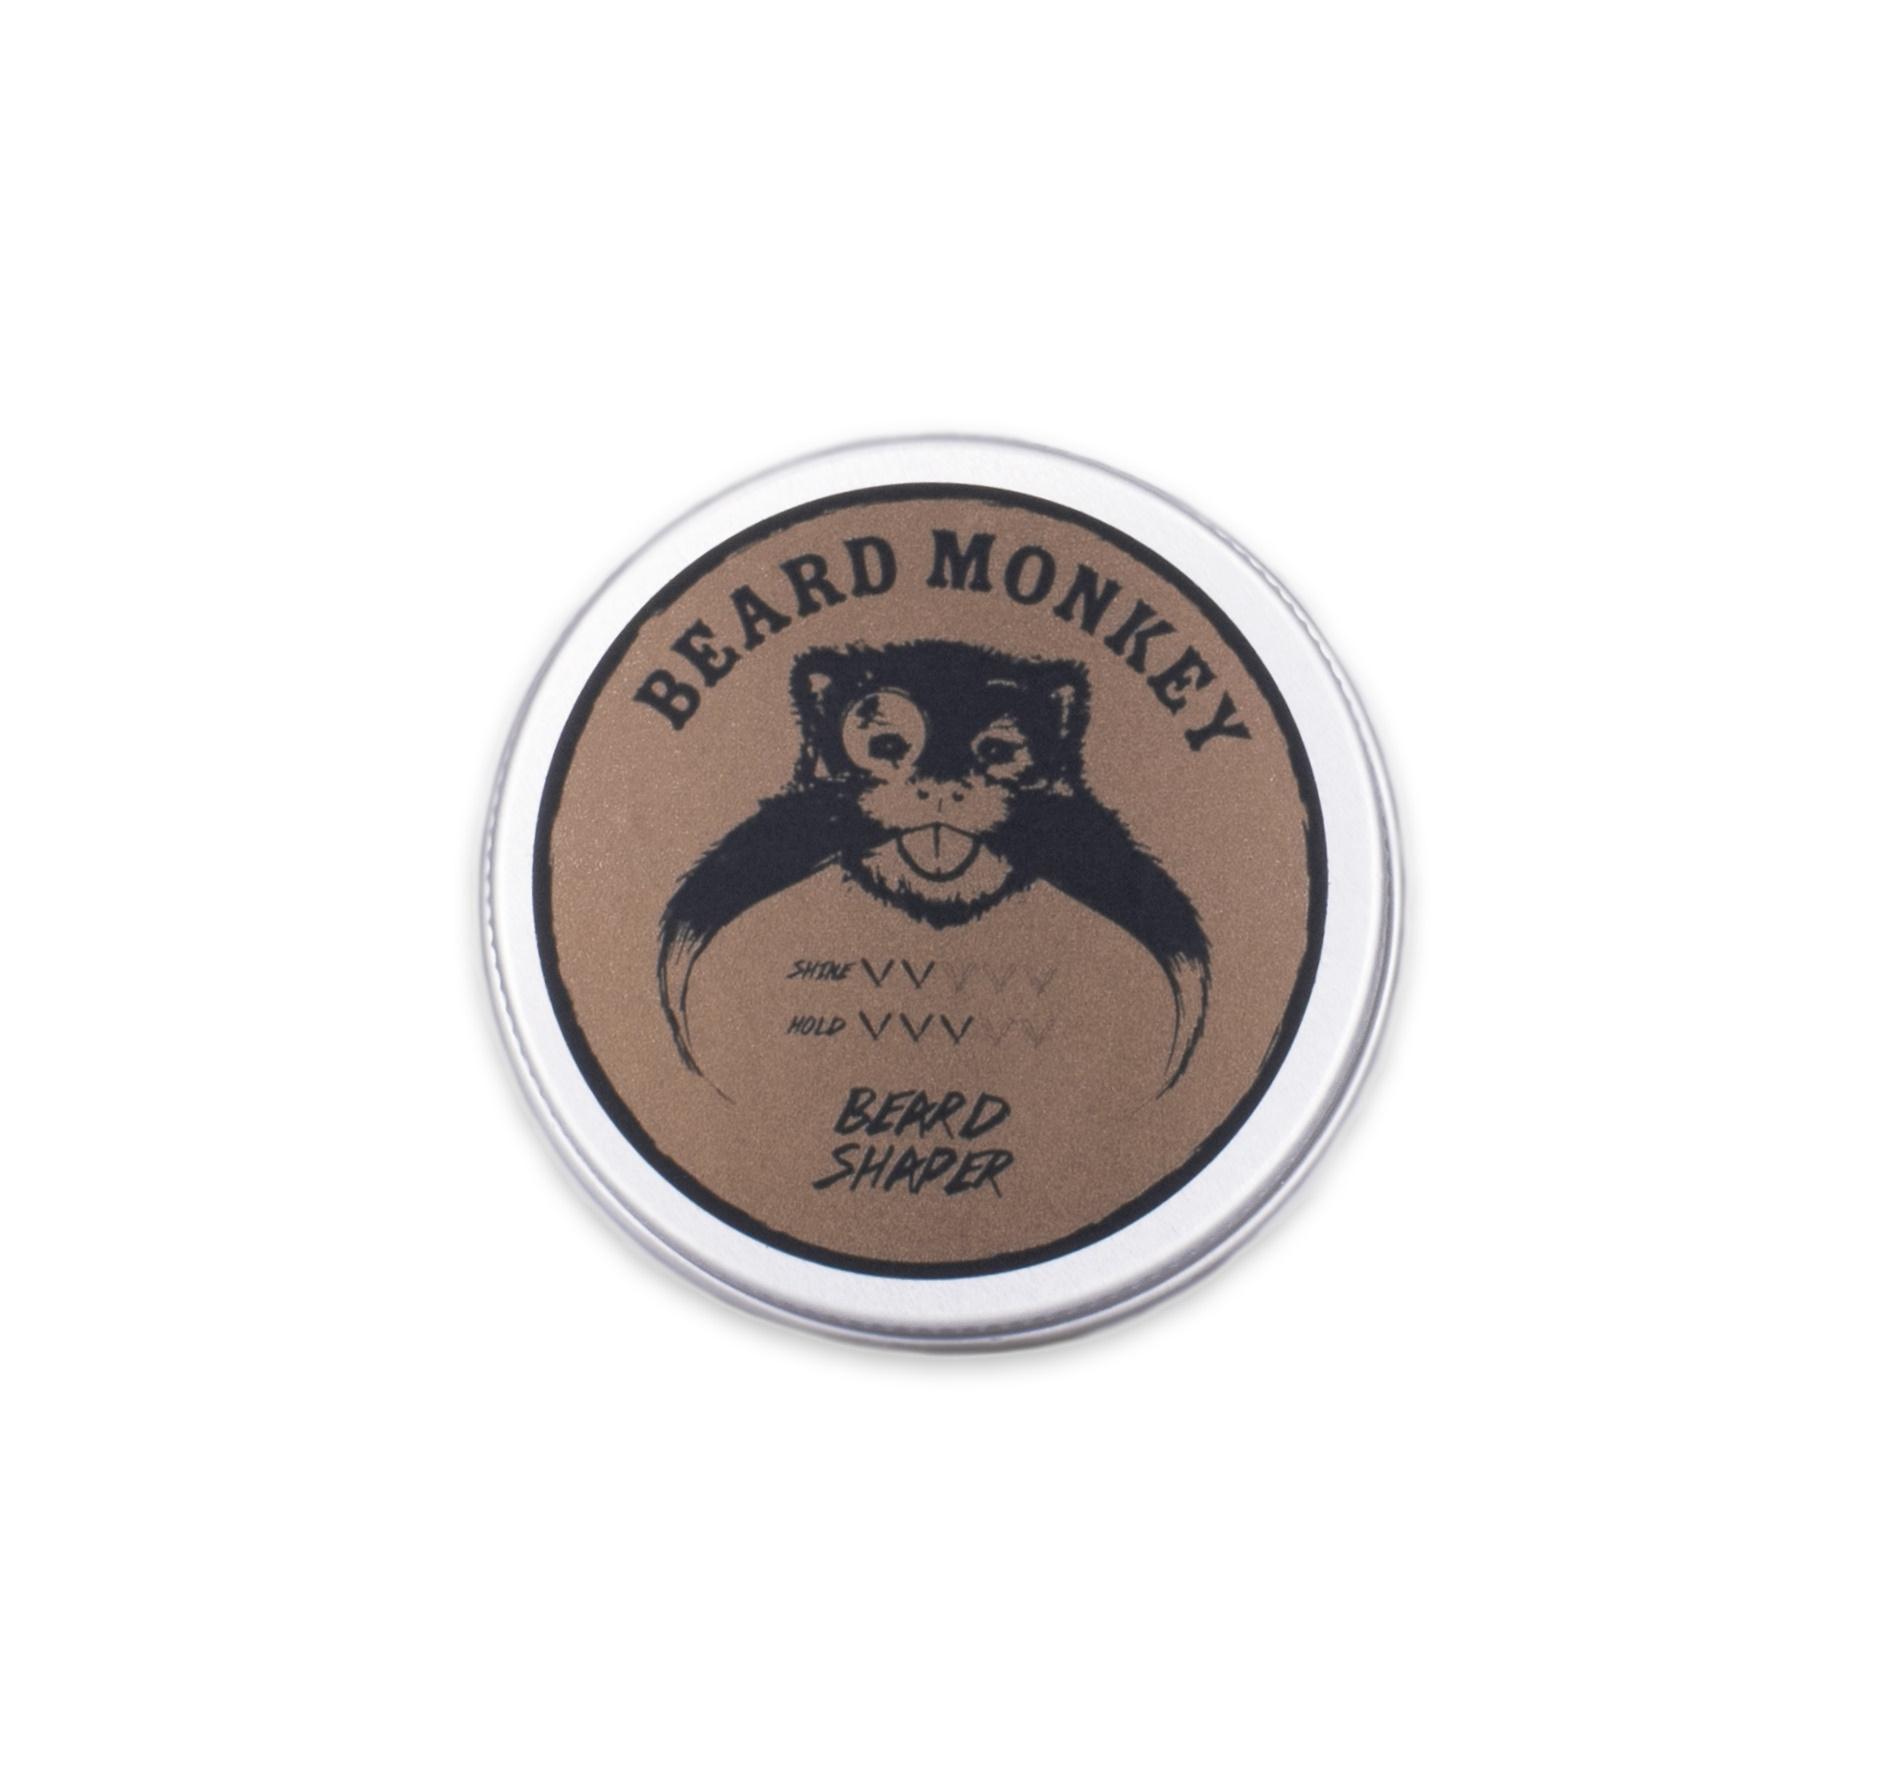 Beard Monkey Beard Wax Shaper Sweet Tobacco 60ml e0f3f14dd4333